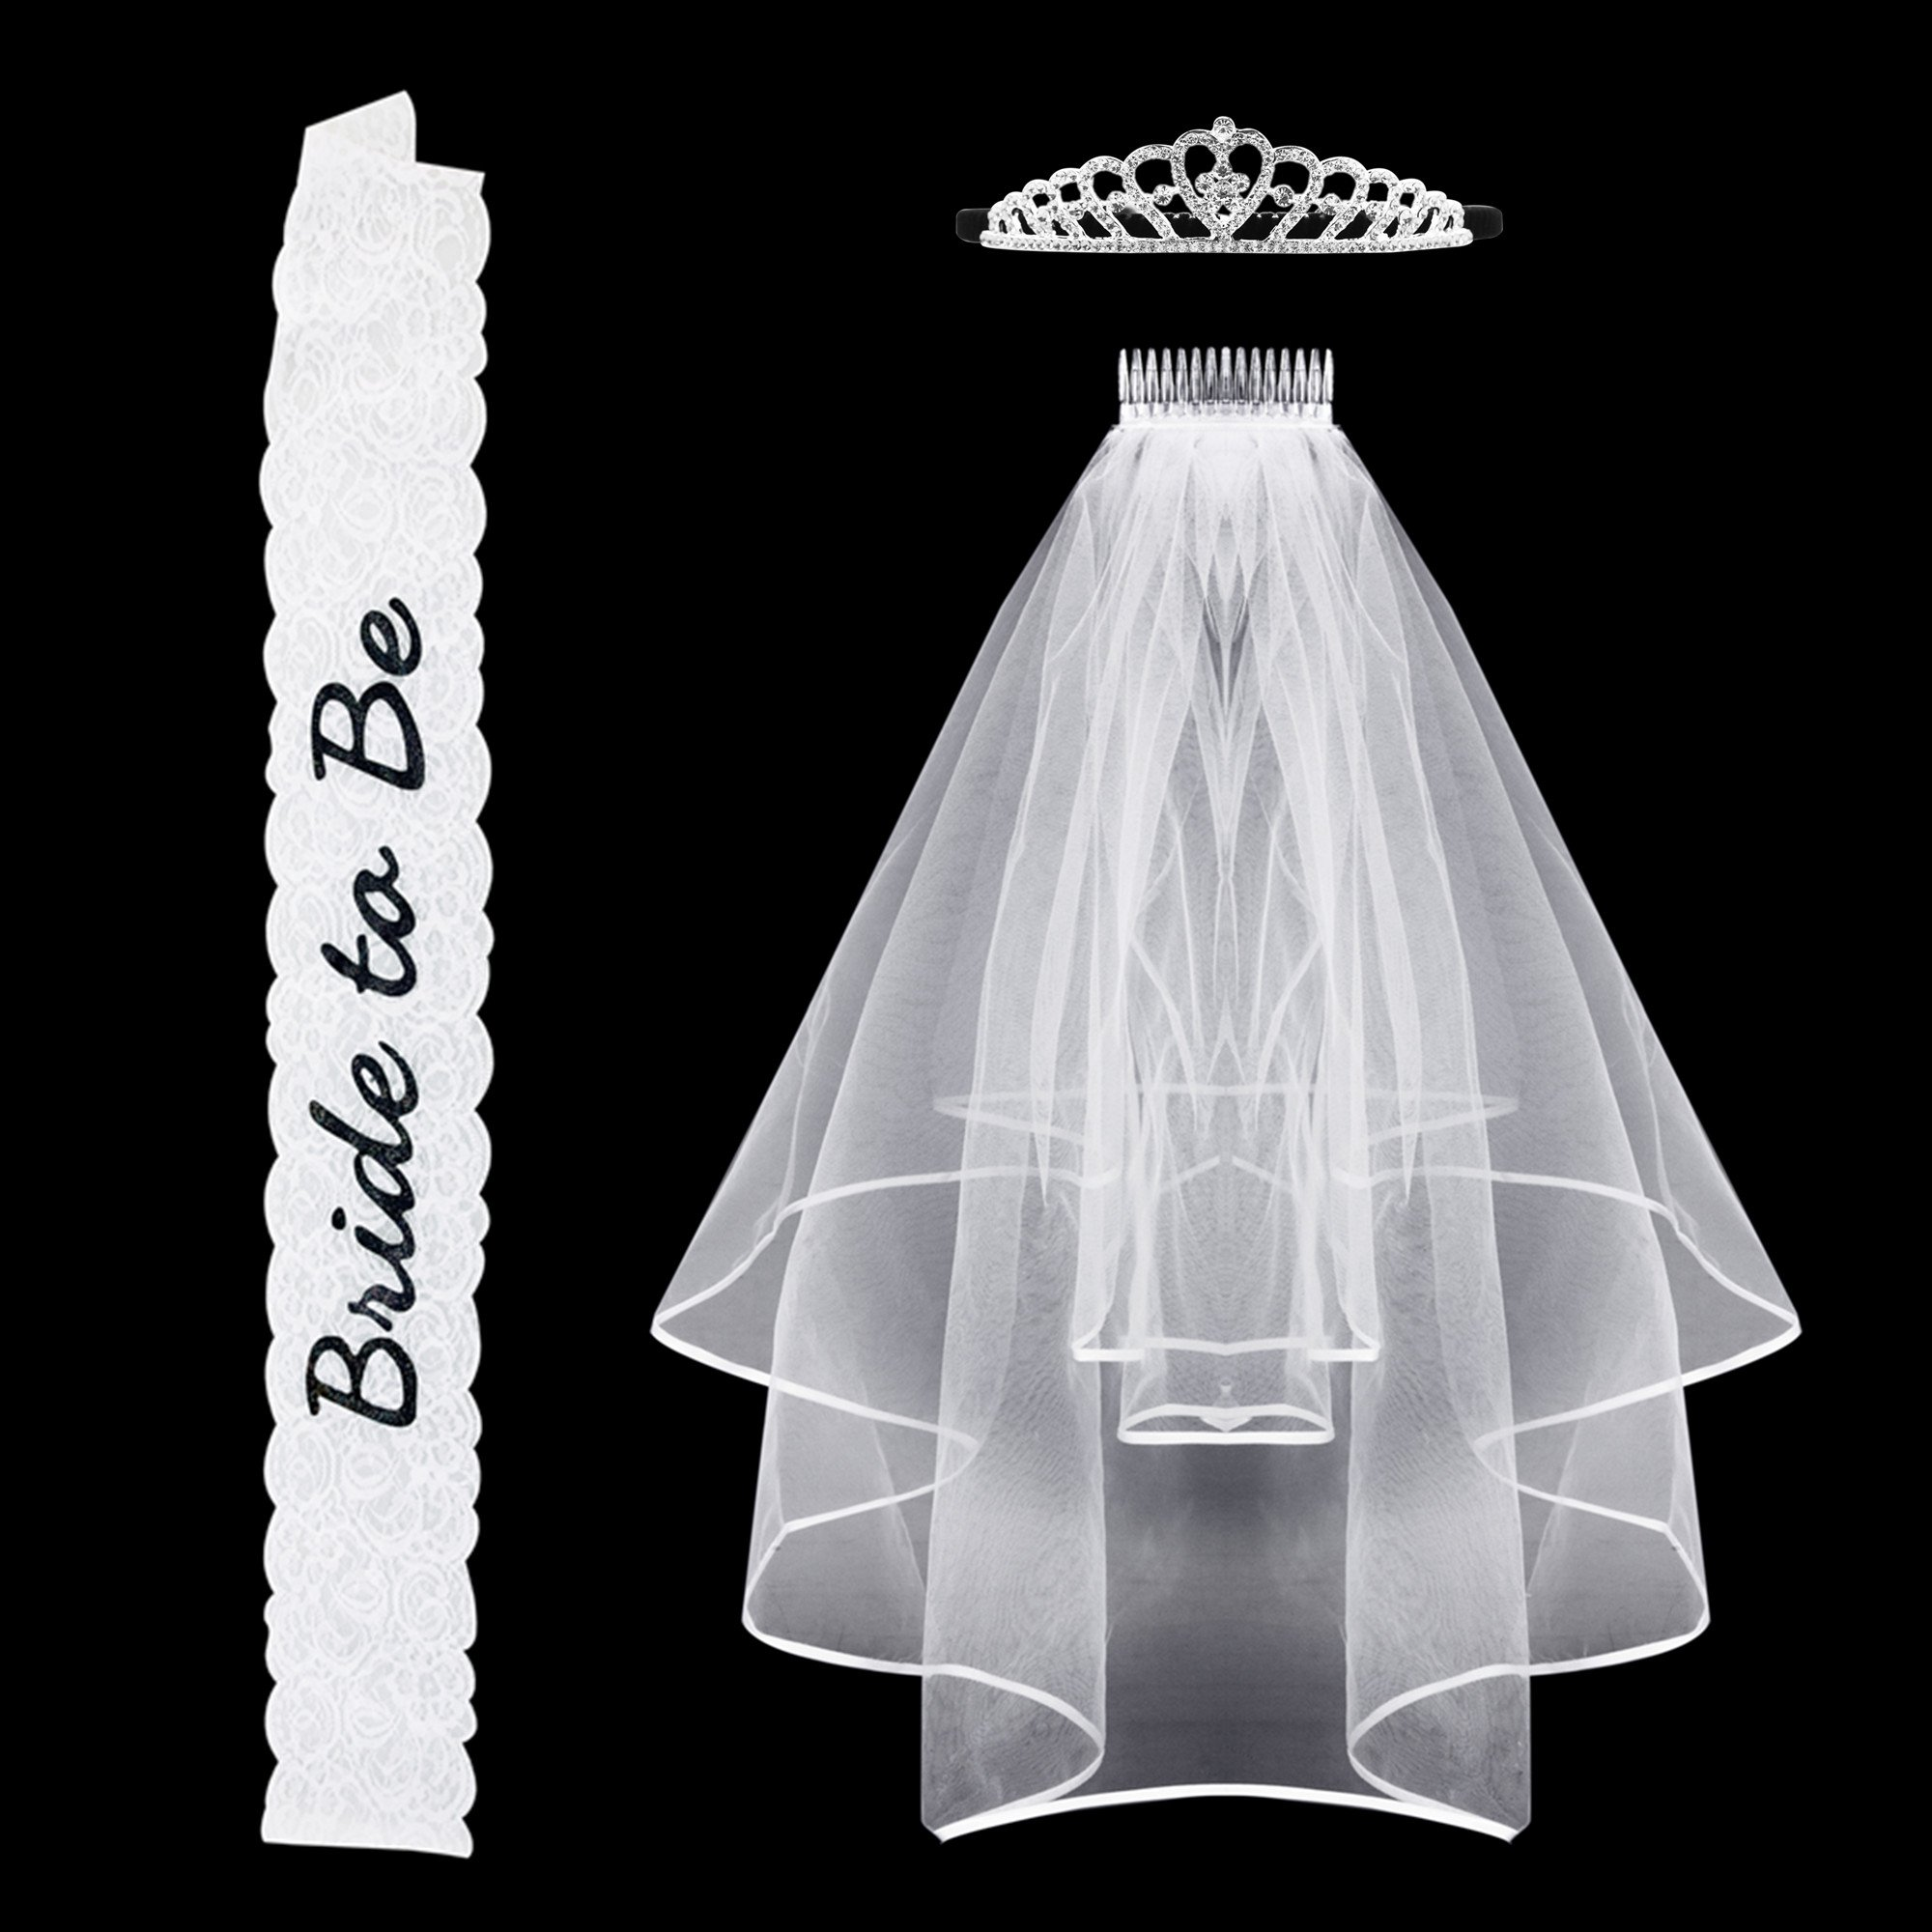 Bachelorette Party Bride To Be Sash Lace & Rhinestone Tiara Crown & Bridal Veil Girls Night Out Game … (Lace)